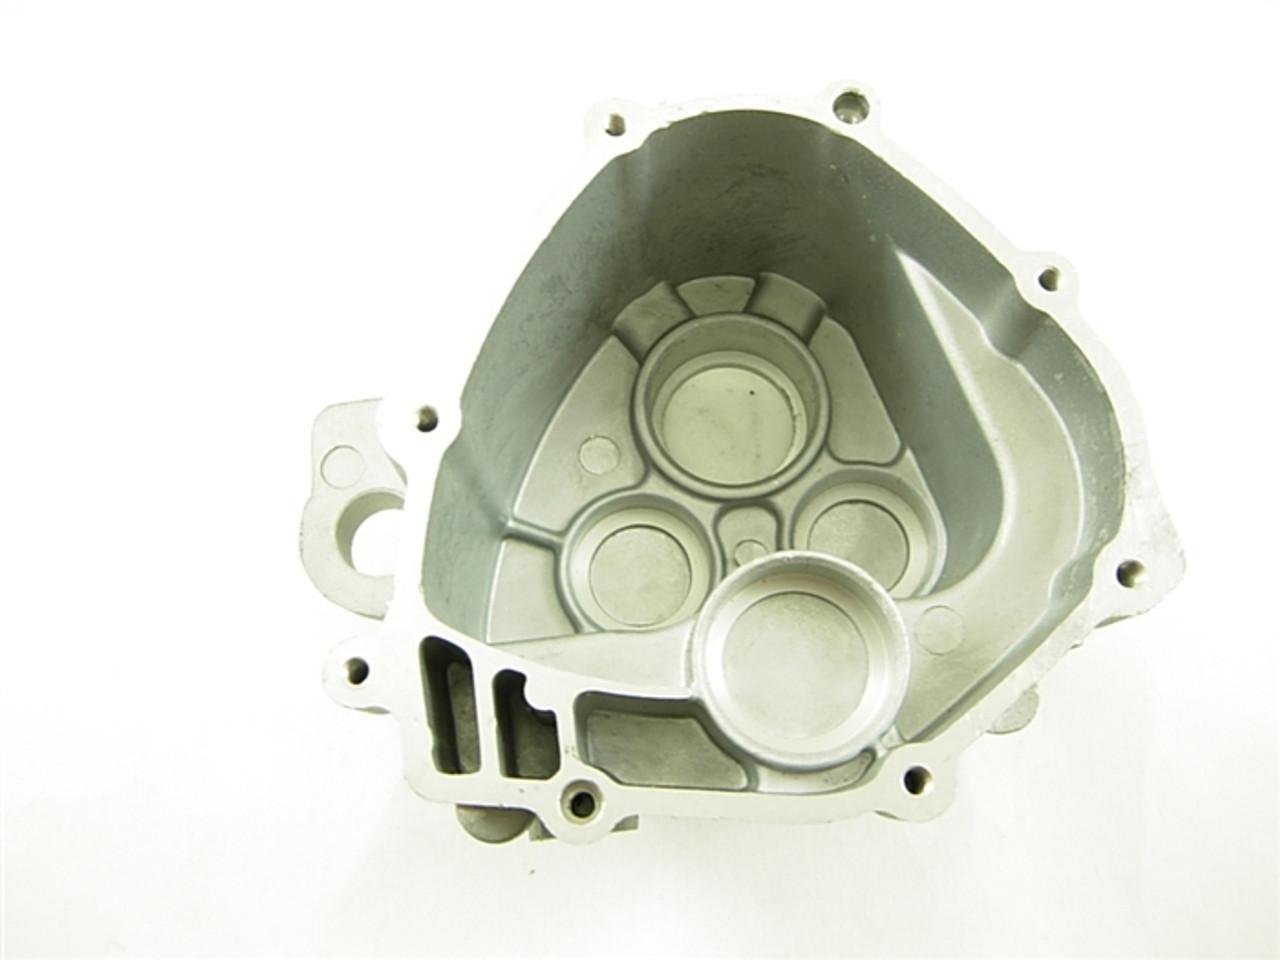 engine cover /gear box 12779-a155-7